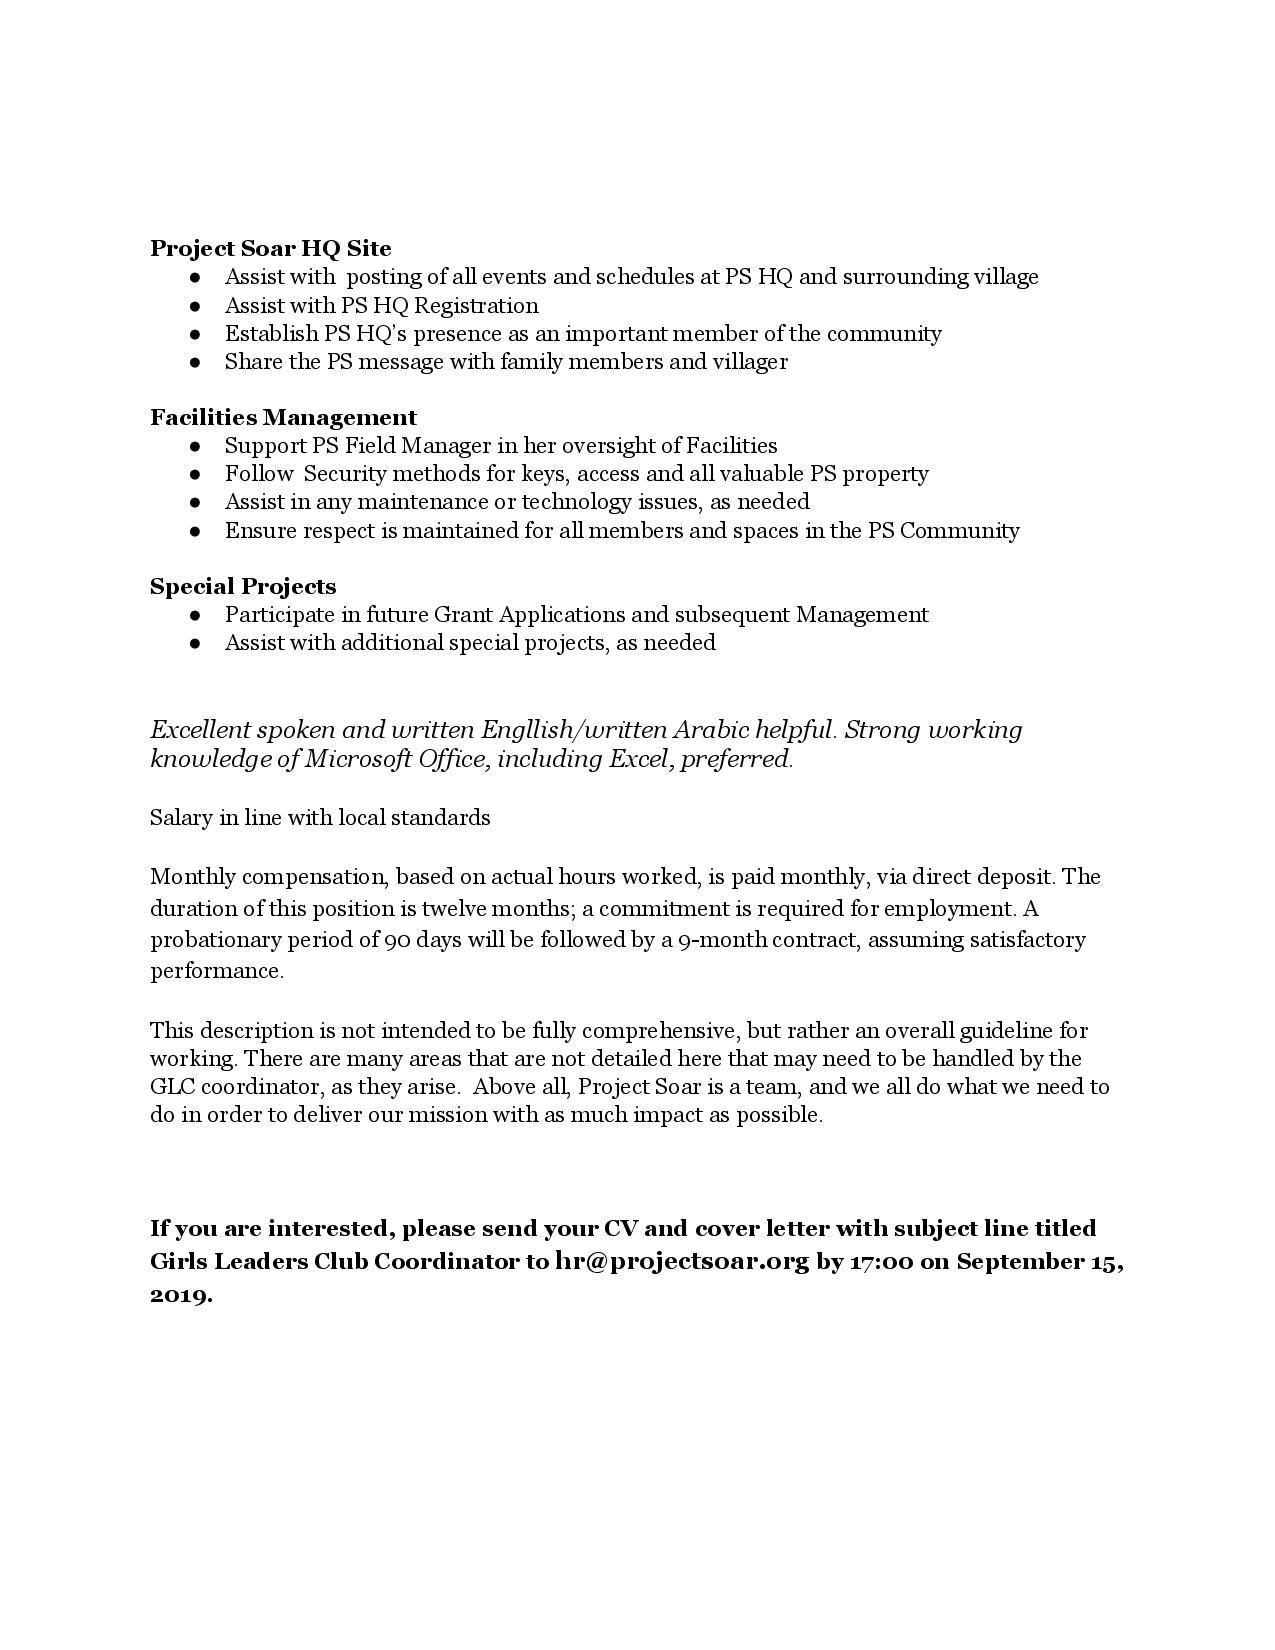 Project Soar Girls Leaders Club Coordinator-page-002.jpg